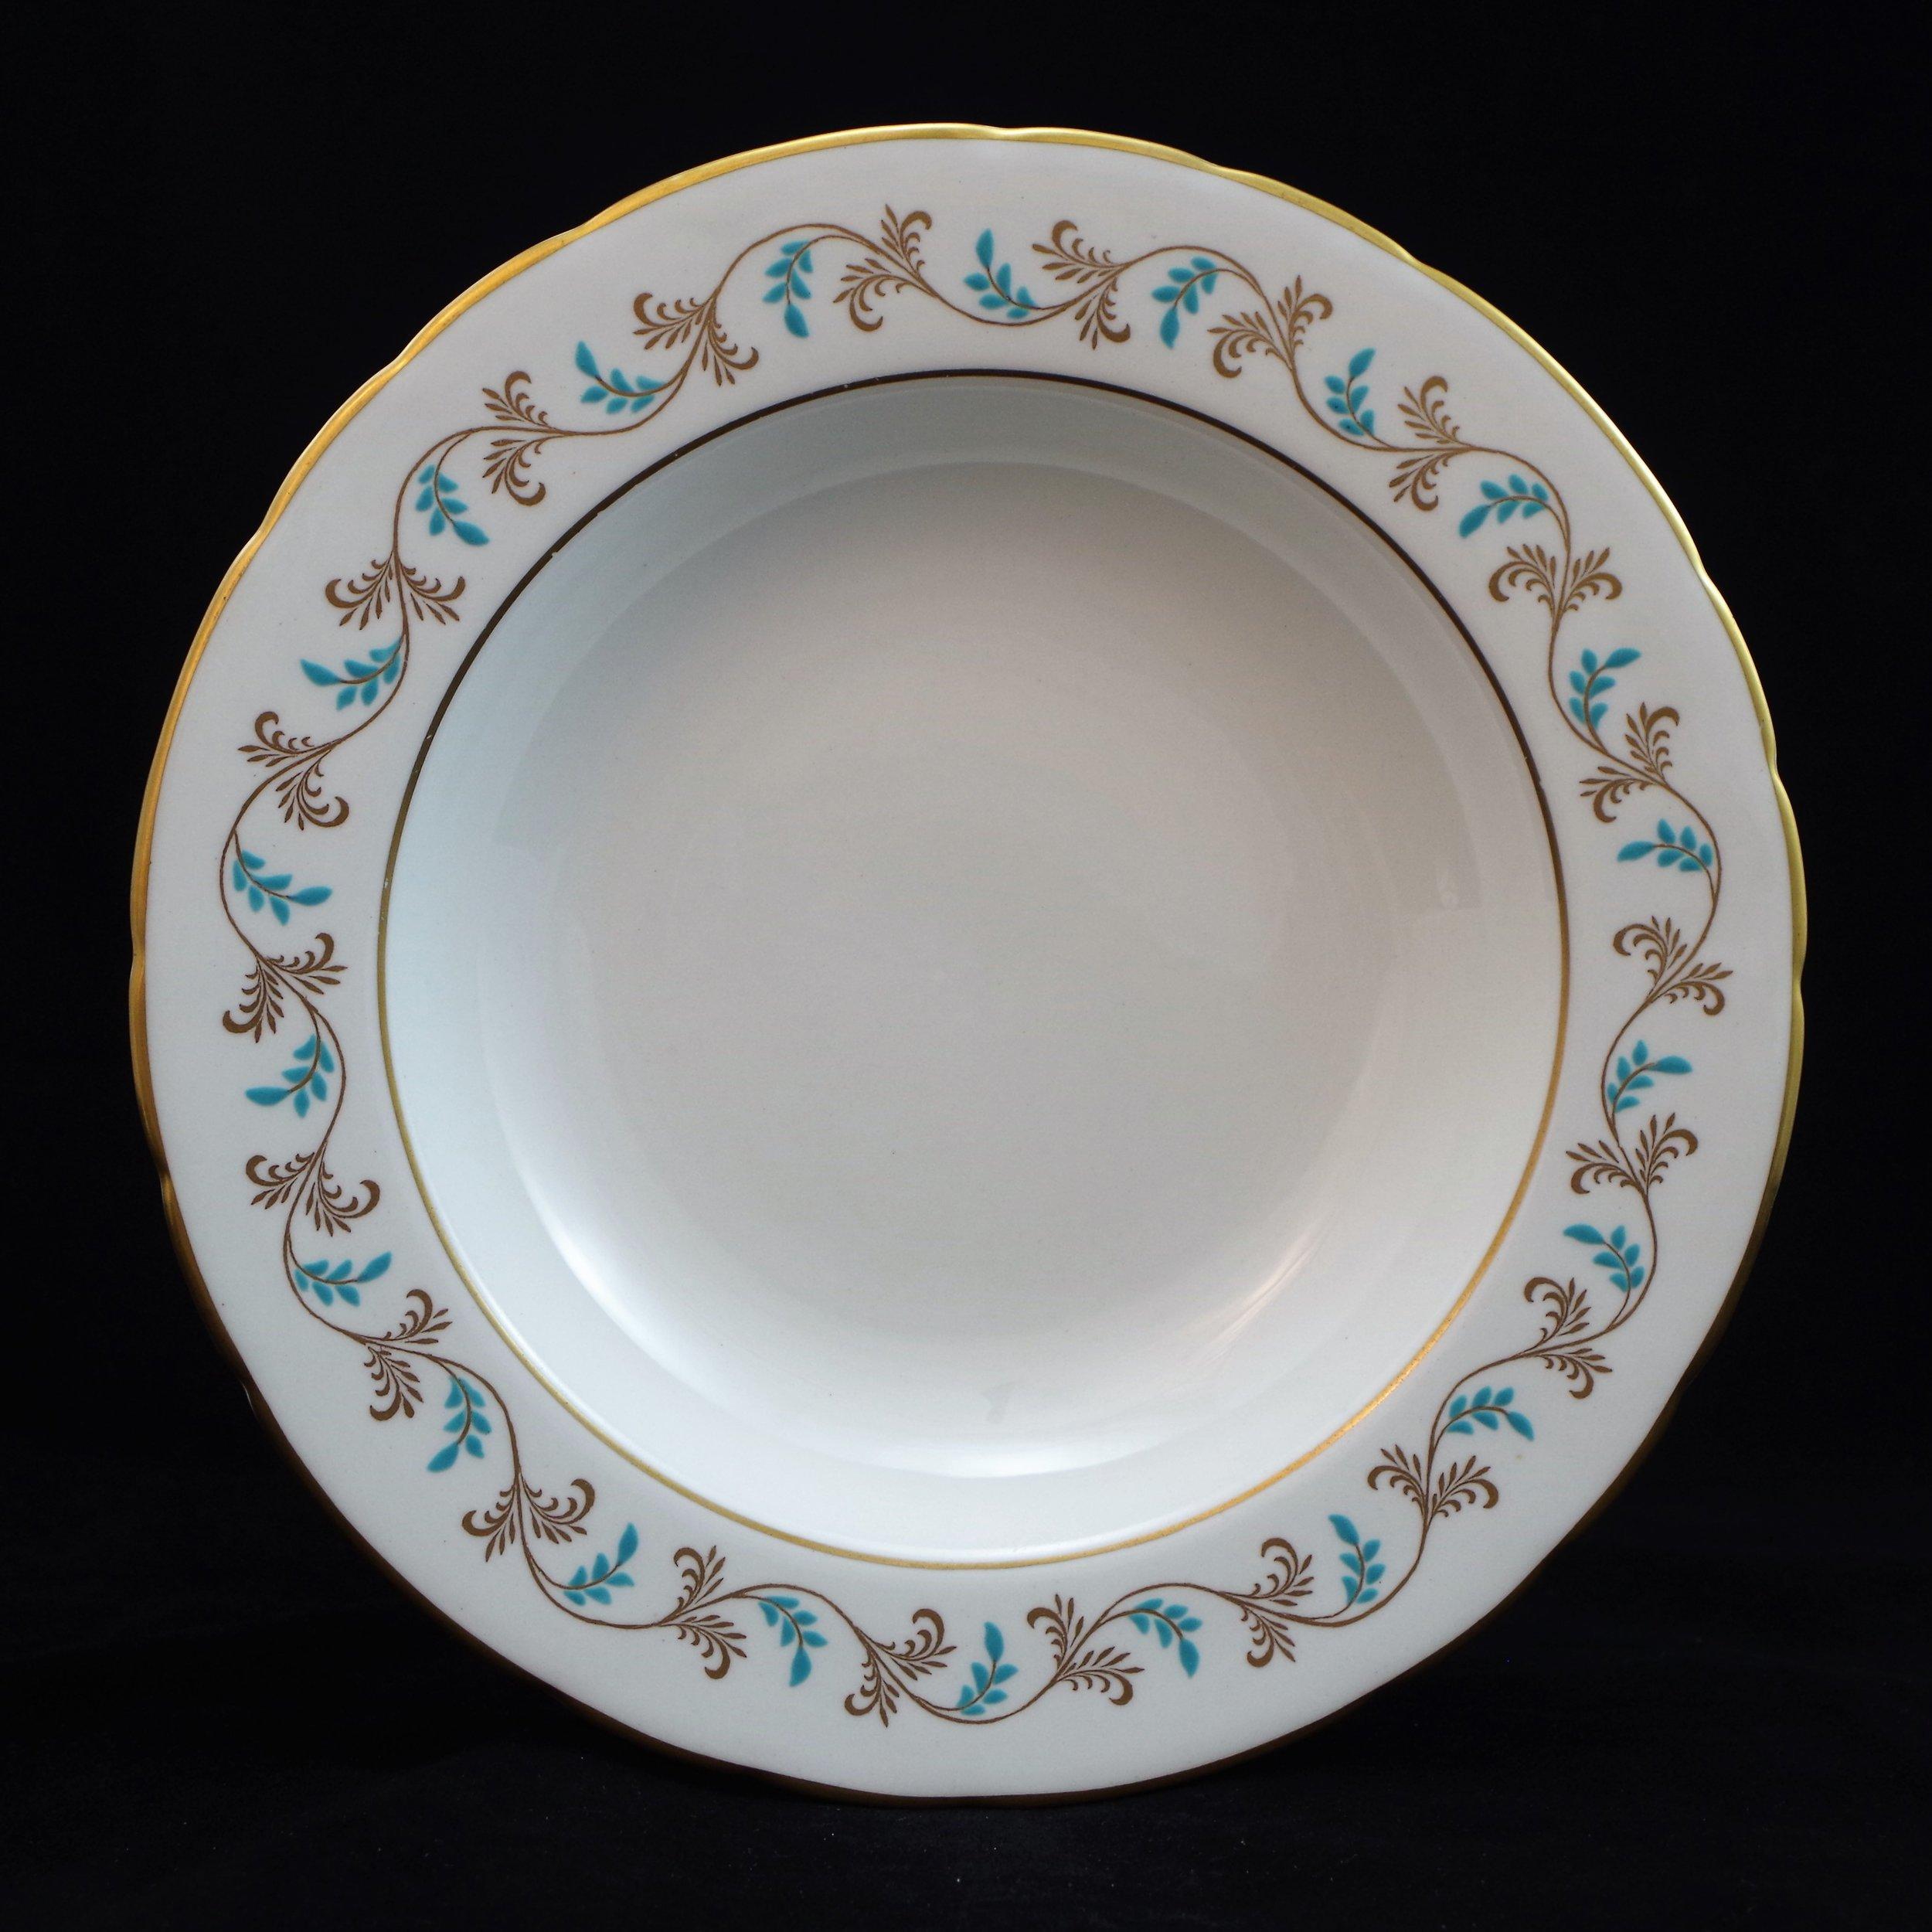 royal-crown-derby-george-VI-diana-pattern-bowl